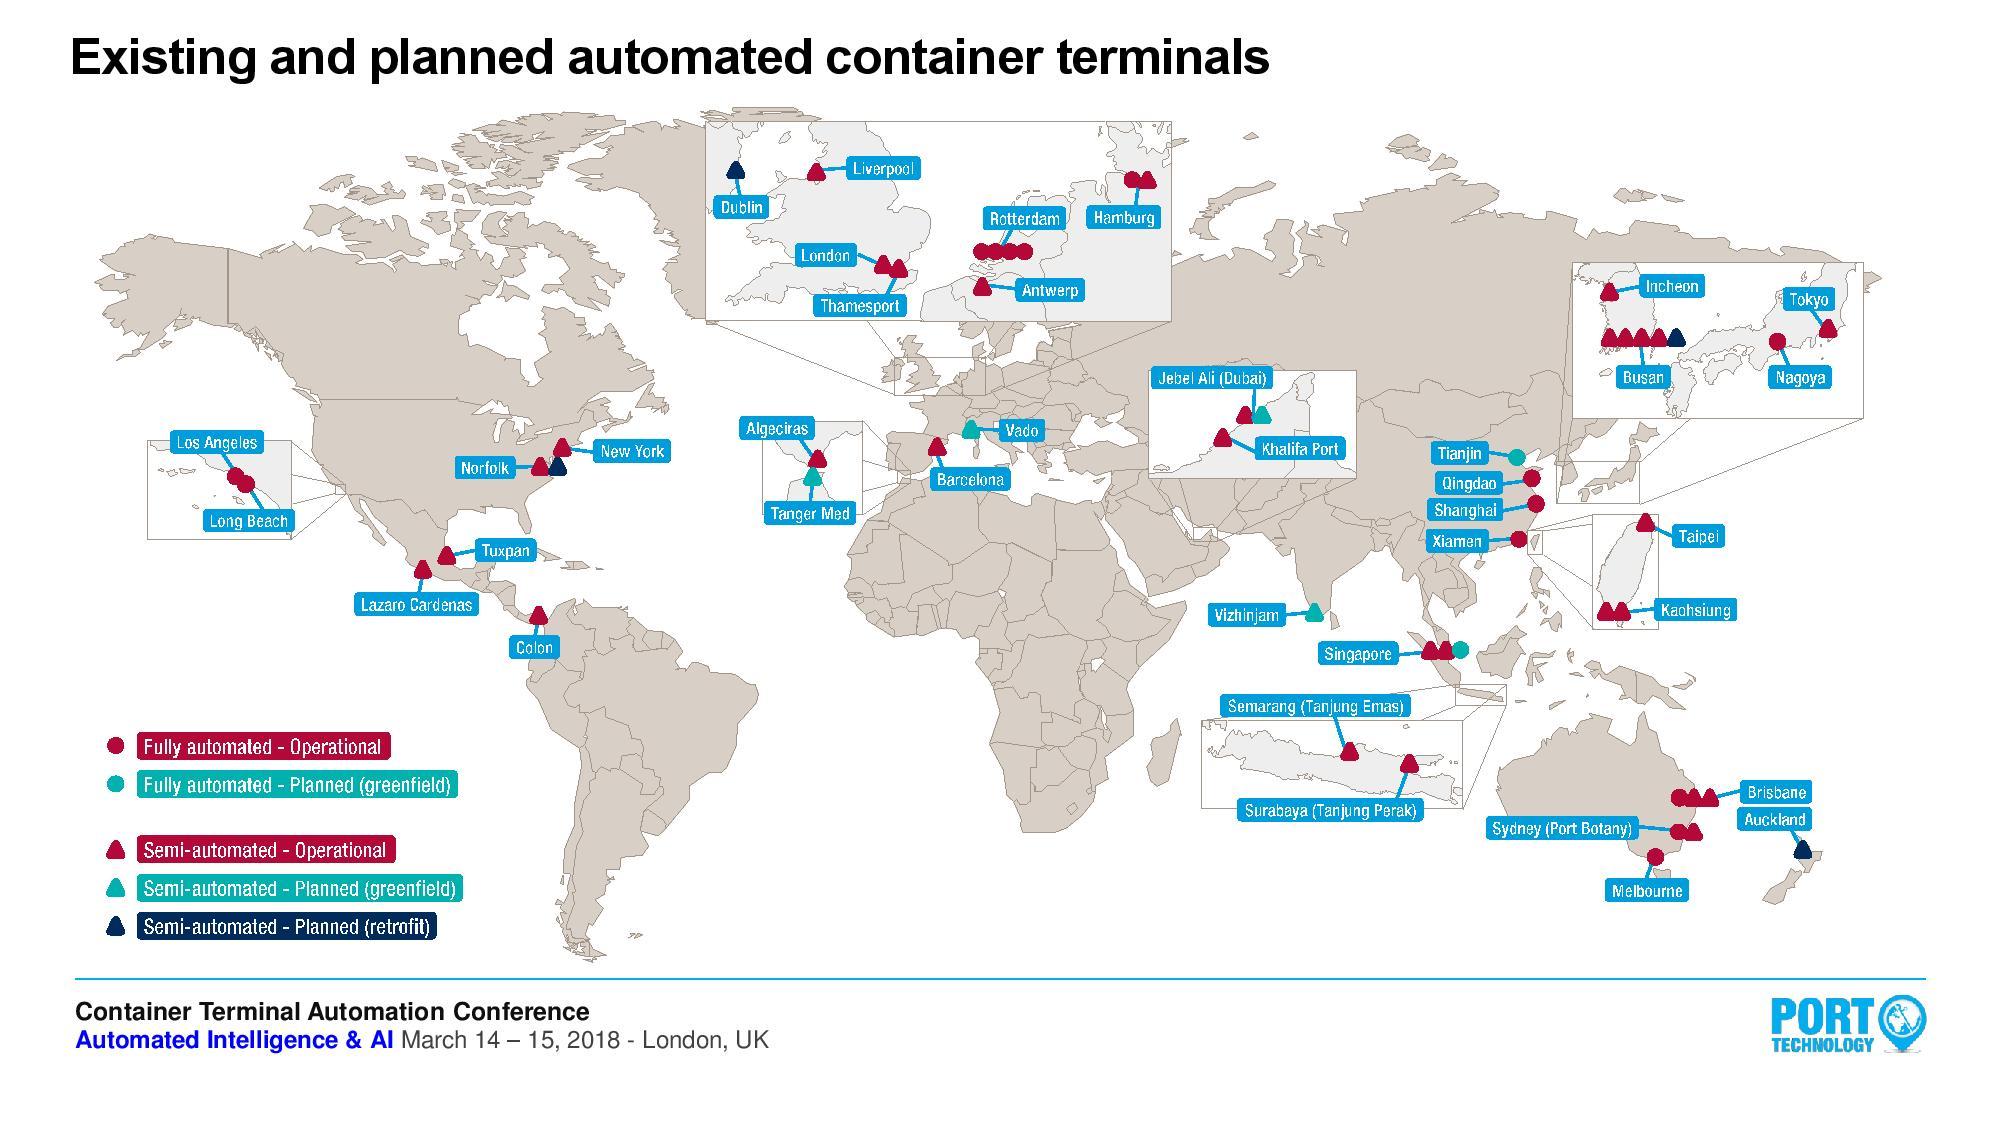 container terminals development forecast